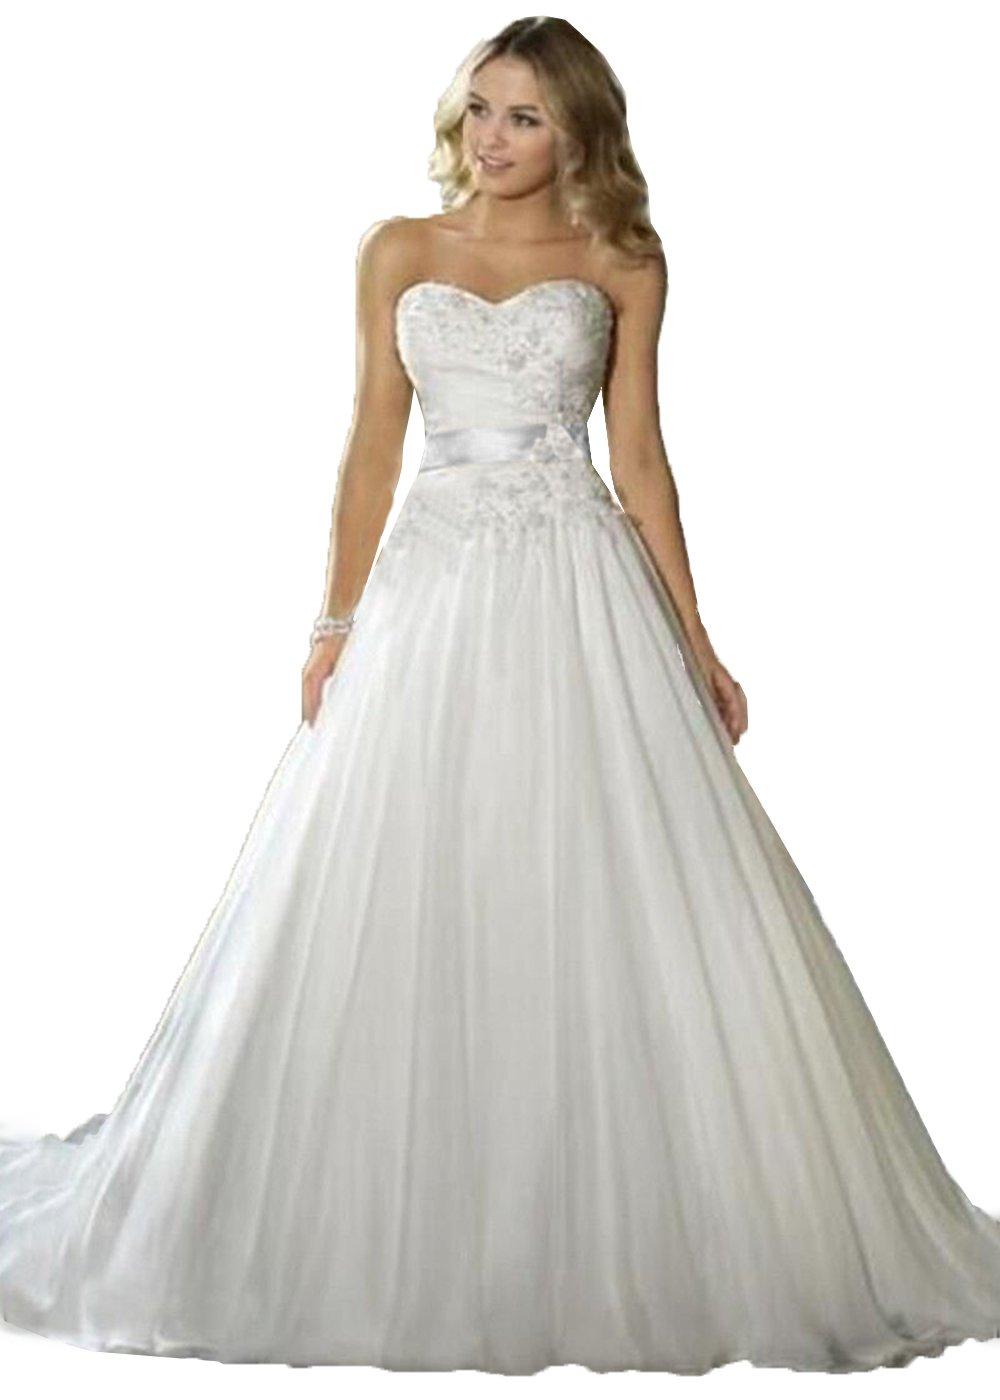 JinXuanYa® woman's New court train applique Beaded Beach wedding dresses (18, White)